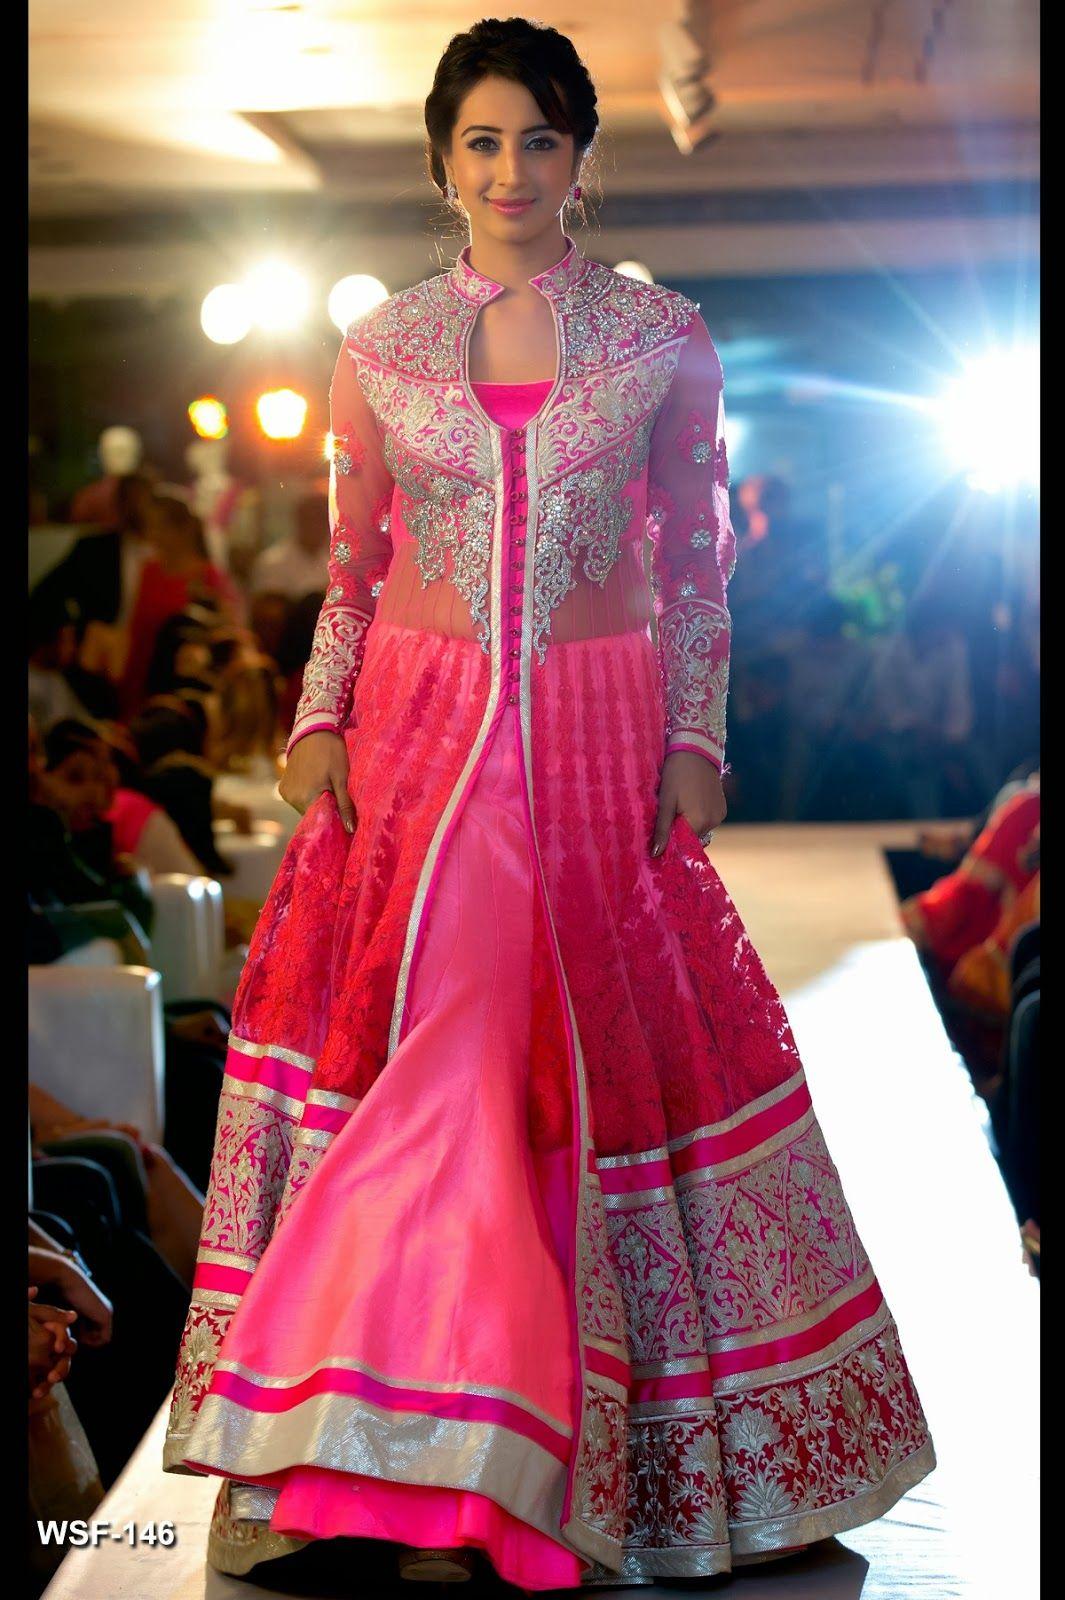 Neerus Fashion Show Collection Sanjana In Pink Salwaar